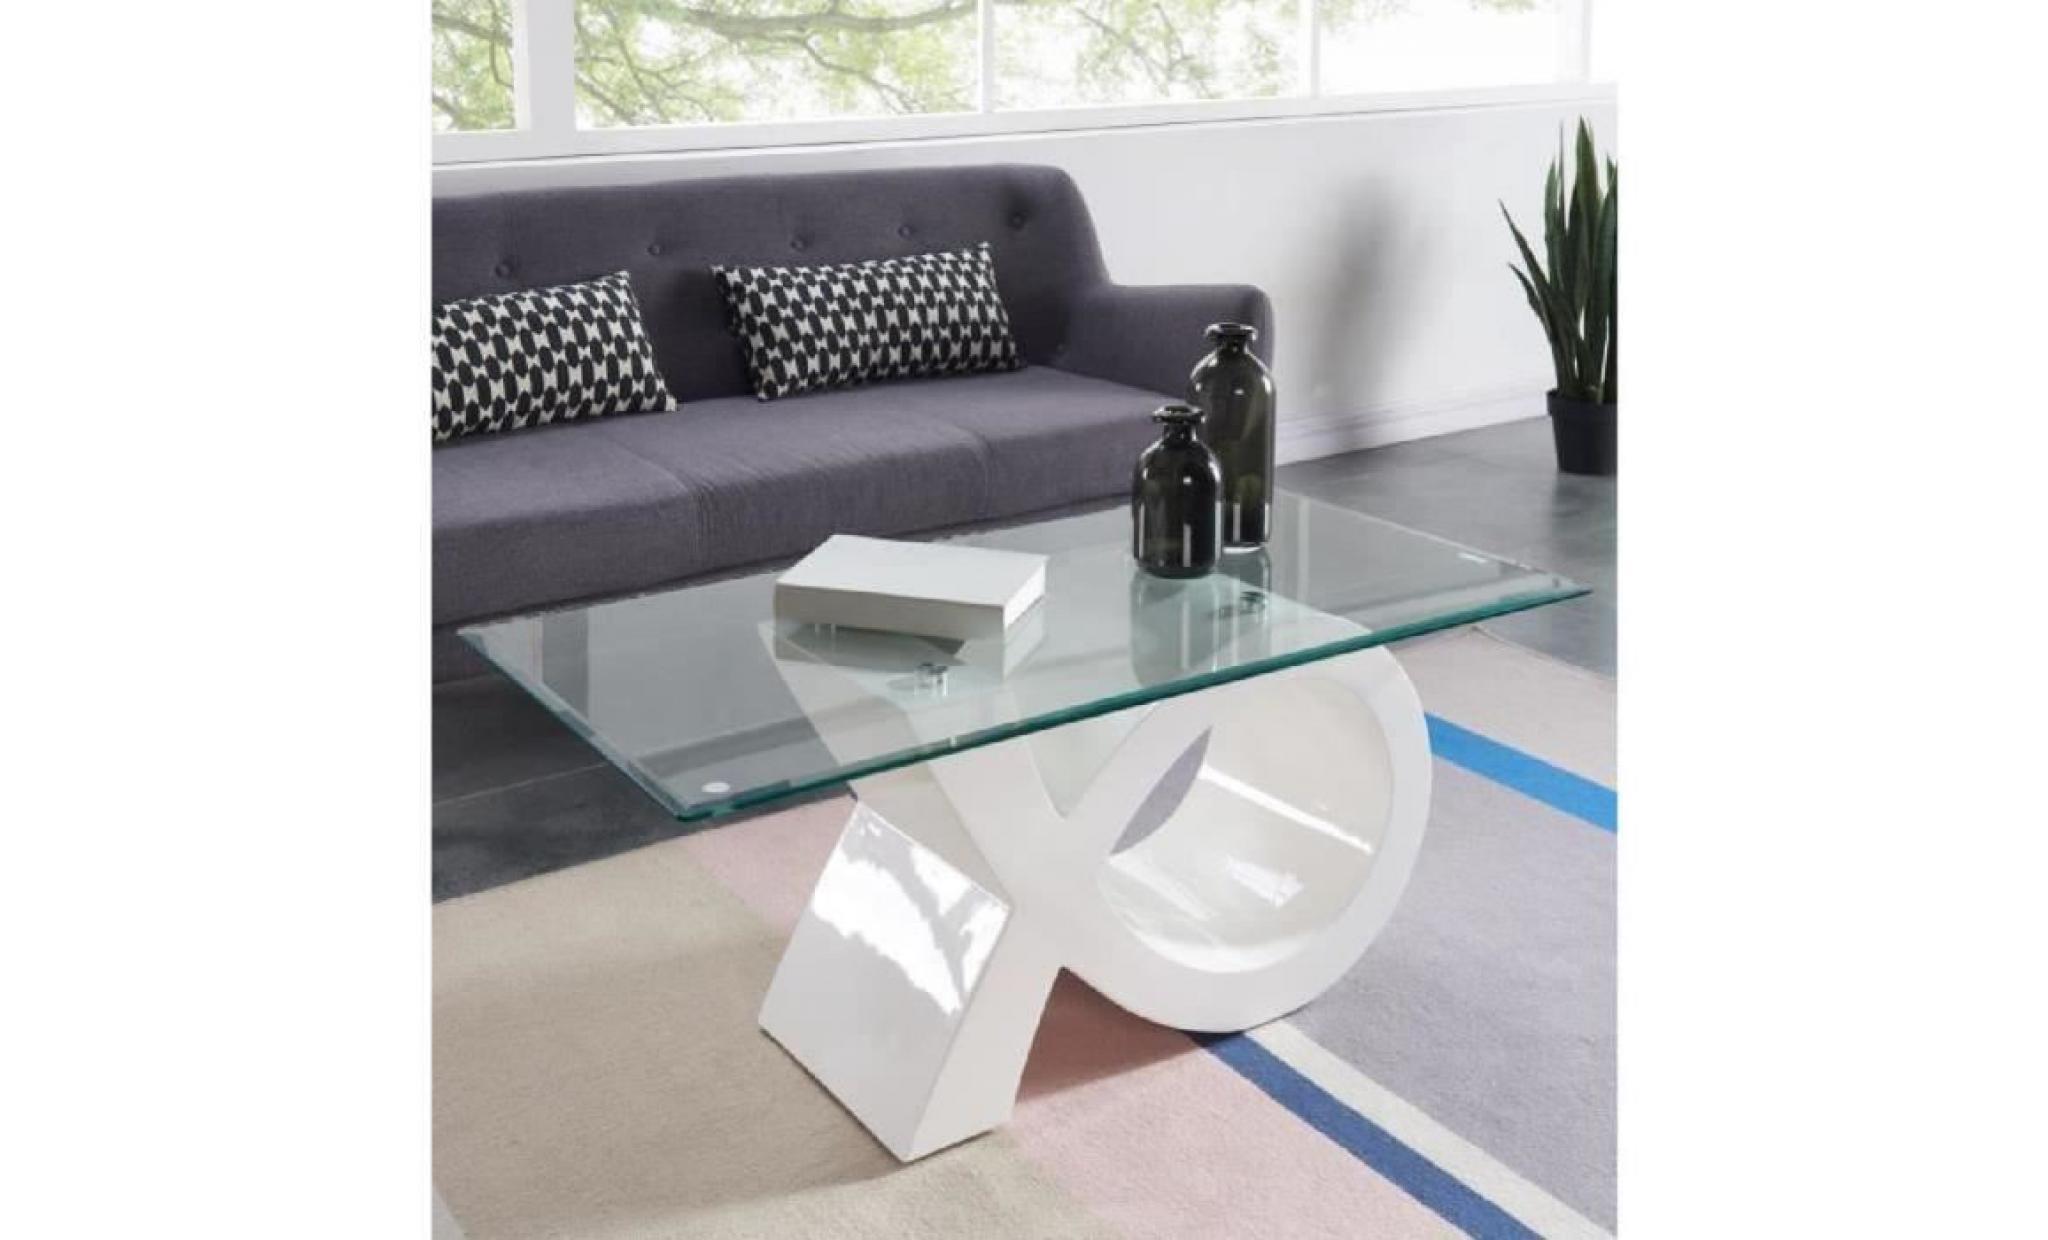 sharon basse laqué 110x55cm contemporain blanc verre brillant table en OyvN8wPmn0